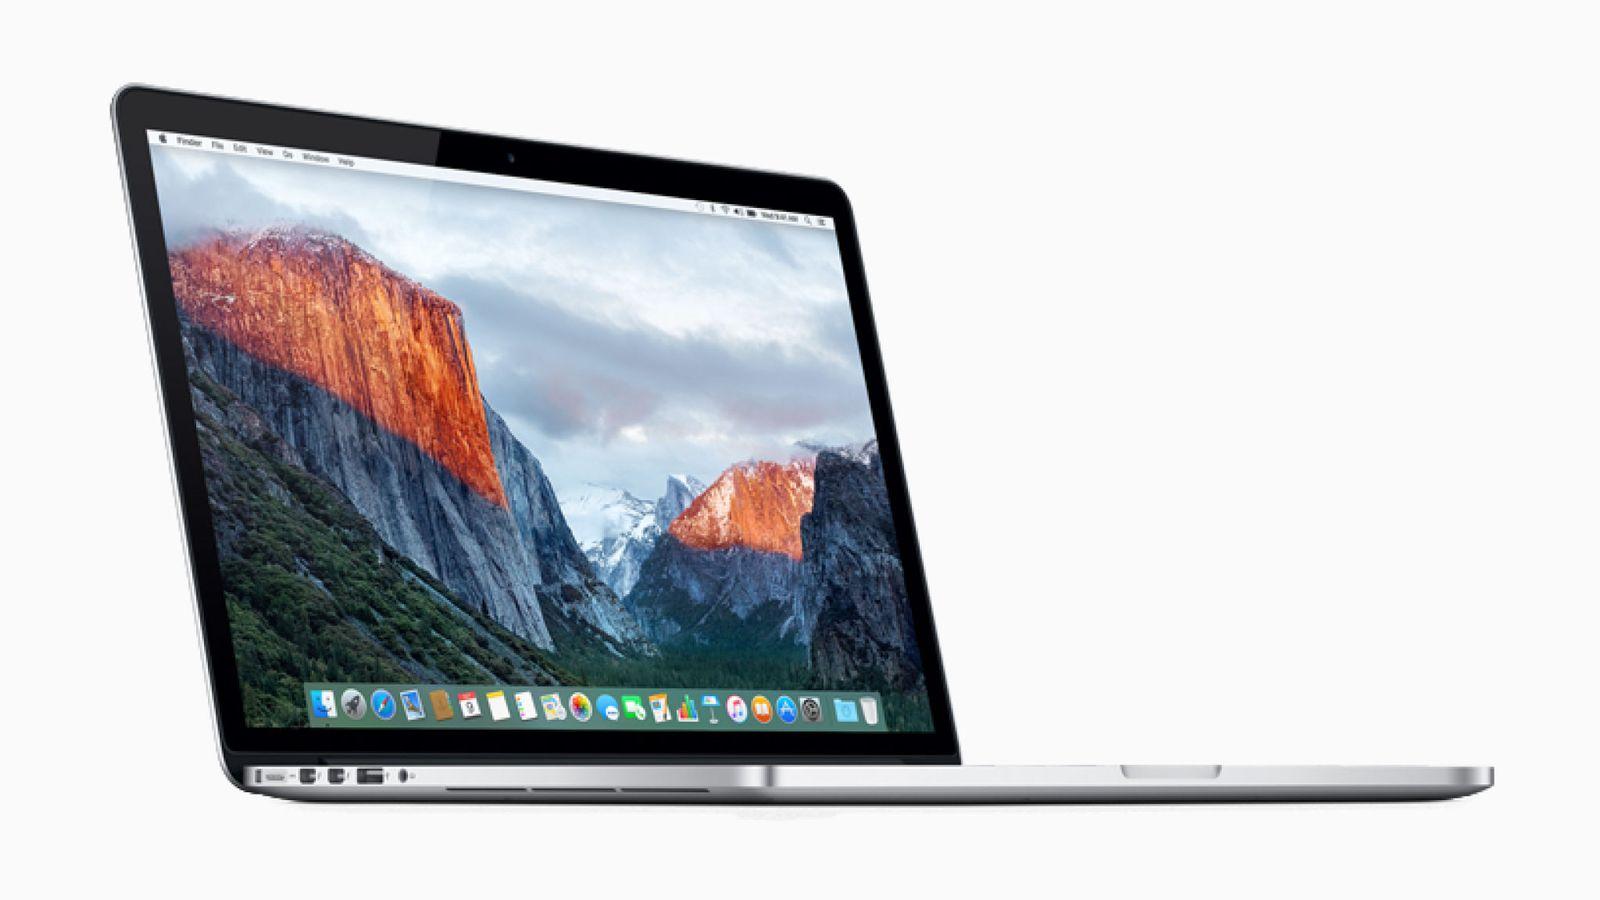 Apple recalls some MacBooks over battery fire risk